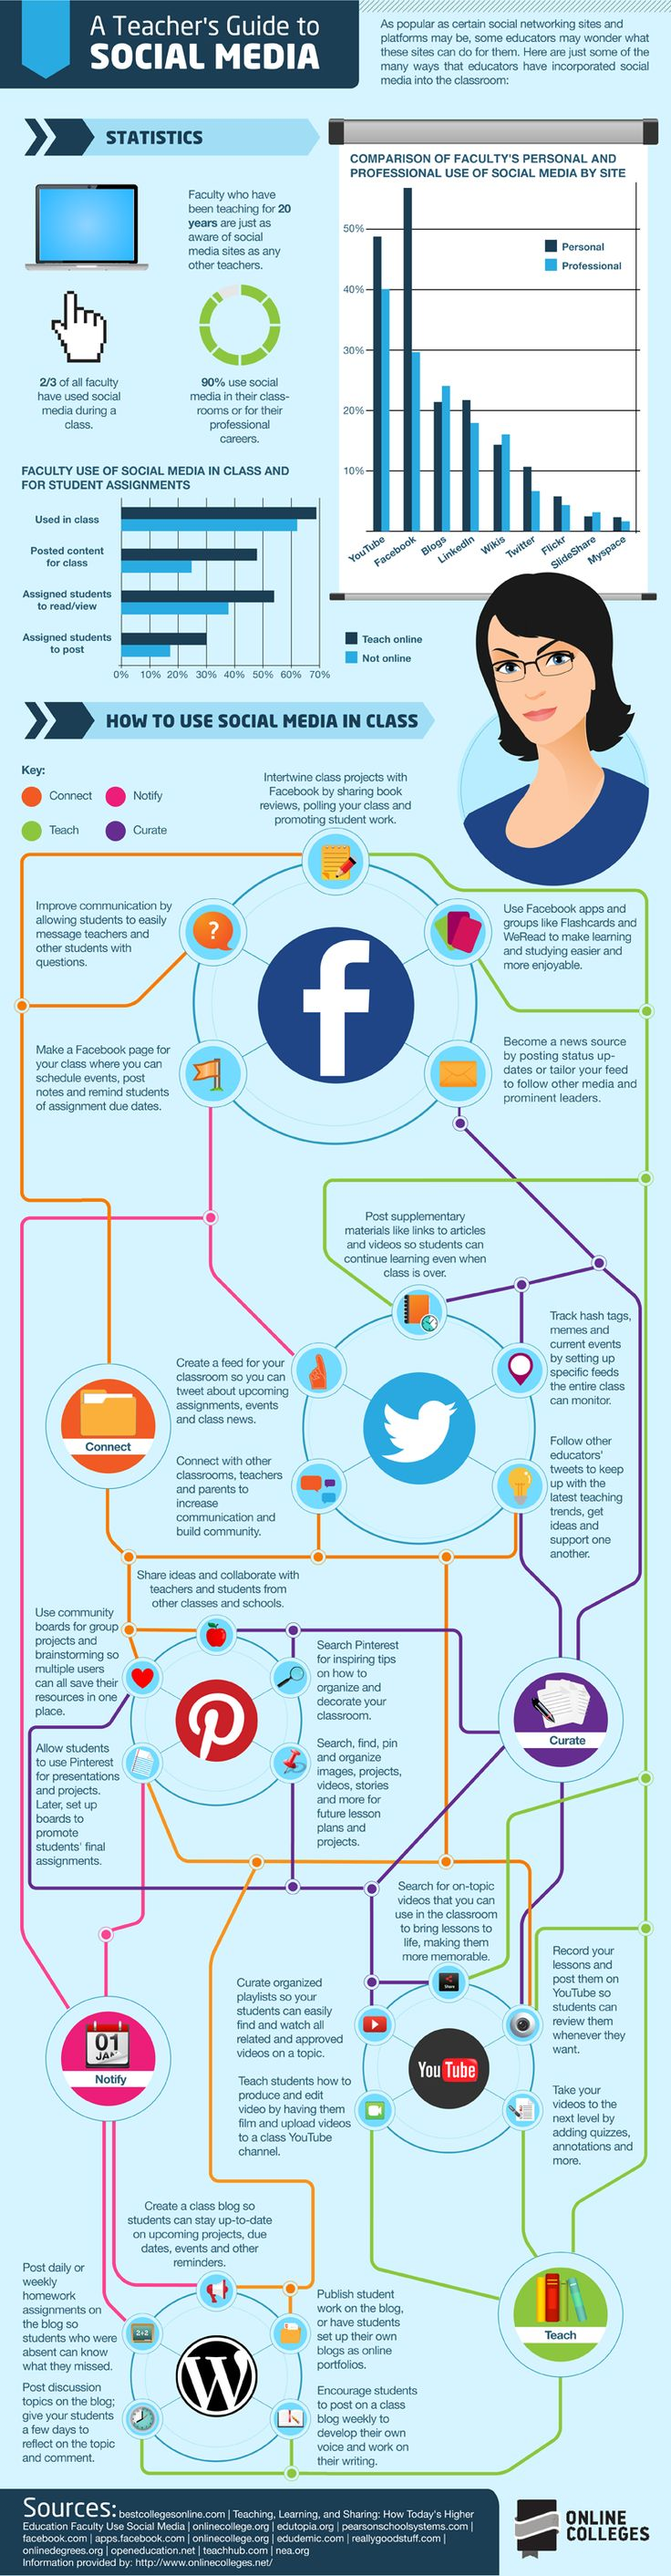 Guia de Social Media para professores